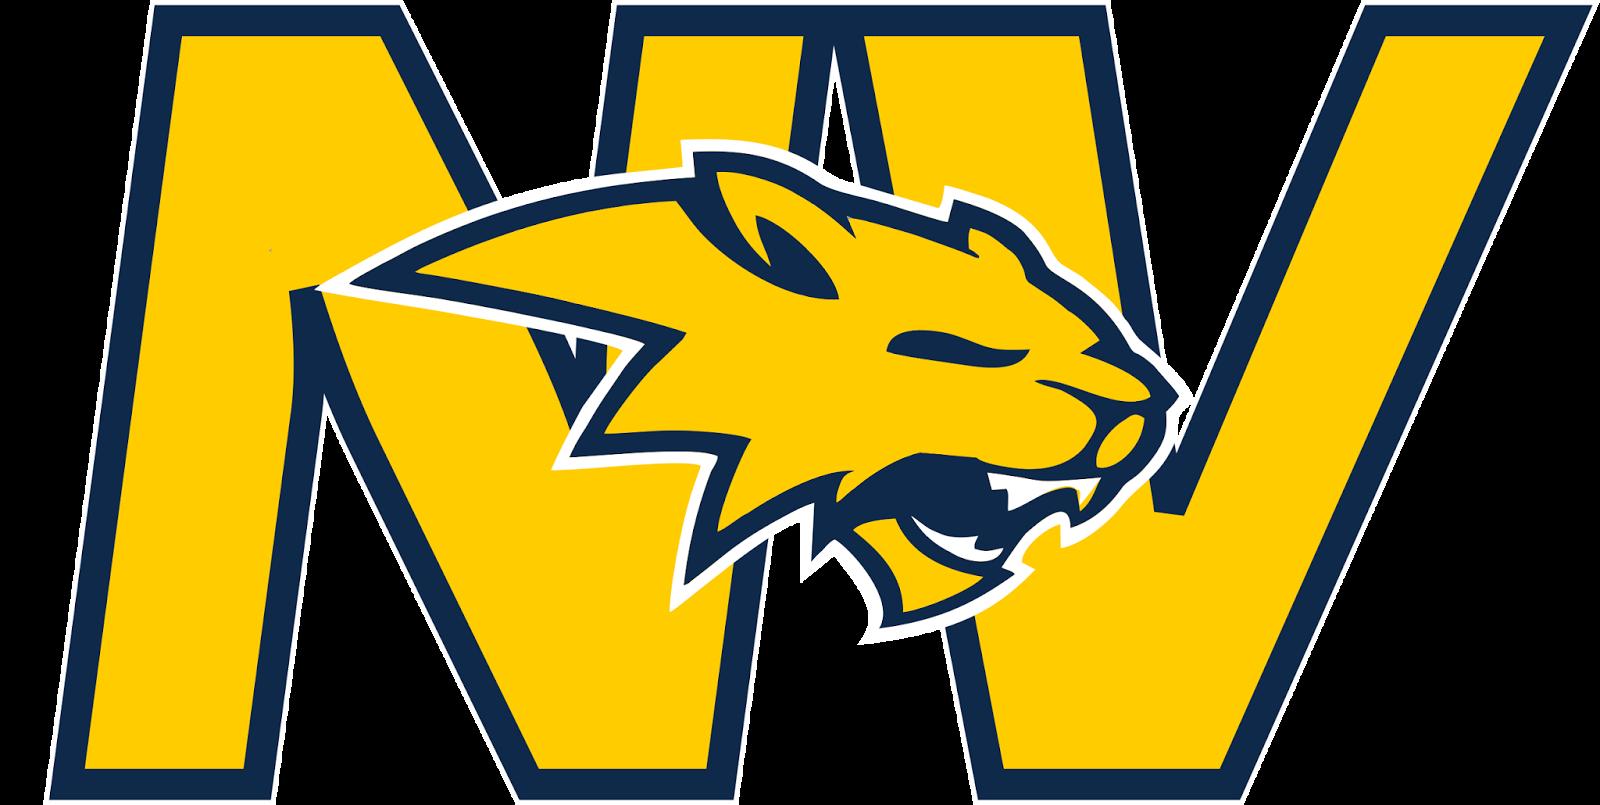 Neuqua valley news track. Wildcat clipart yellow